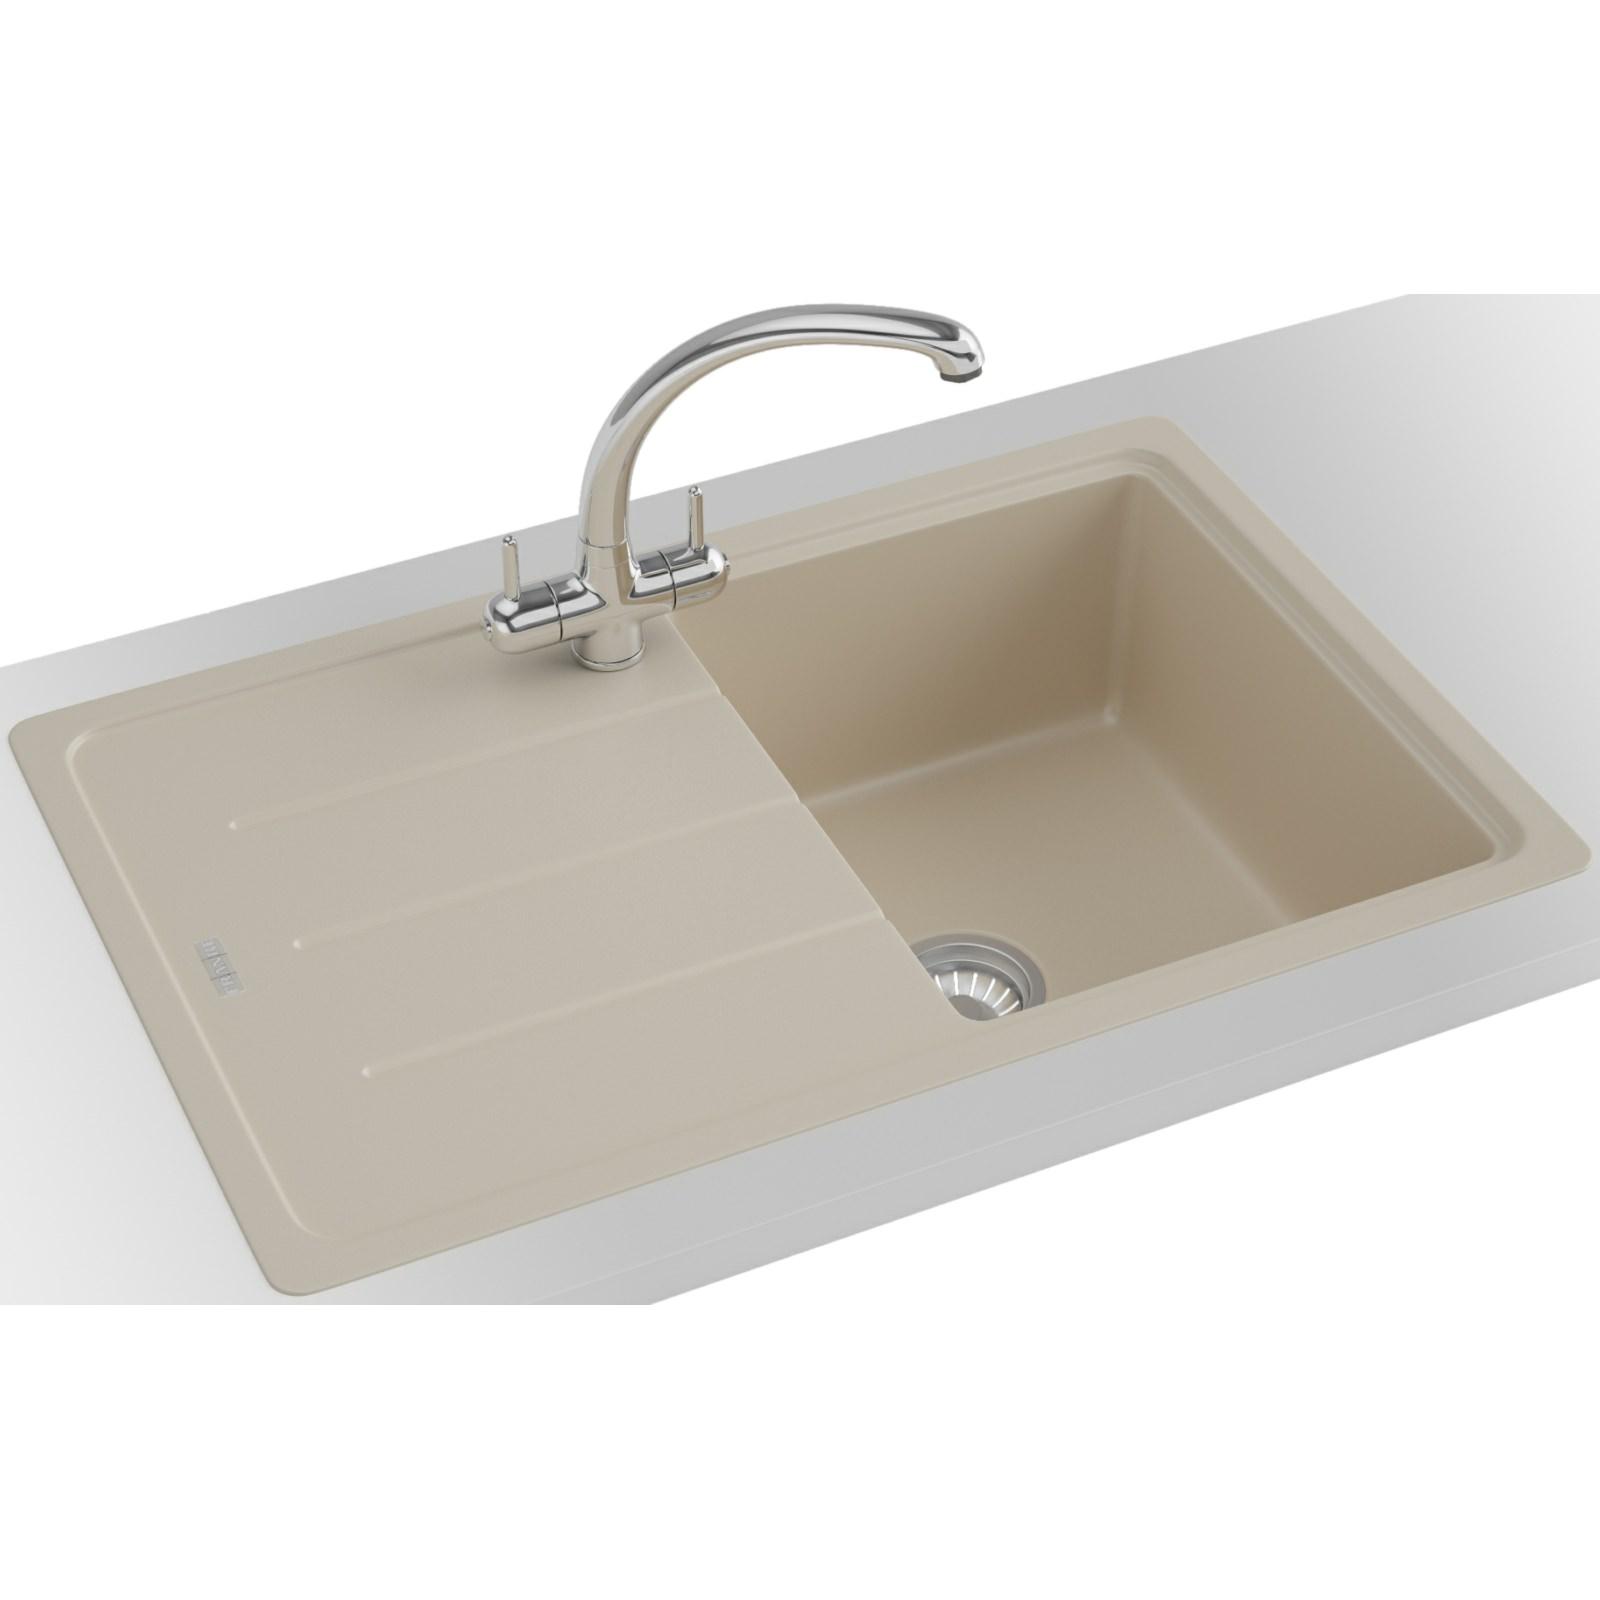 franco kitchen sinks menards backsplash franke basis bfg 611 780 fragranite coffee 1 bowl